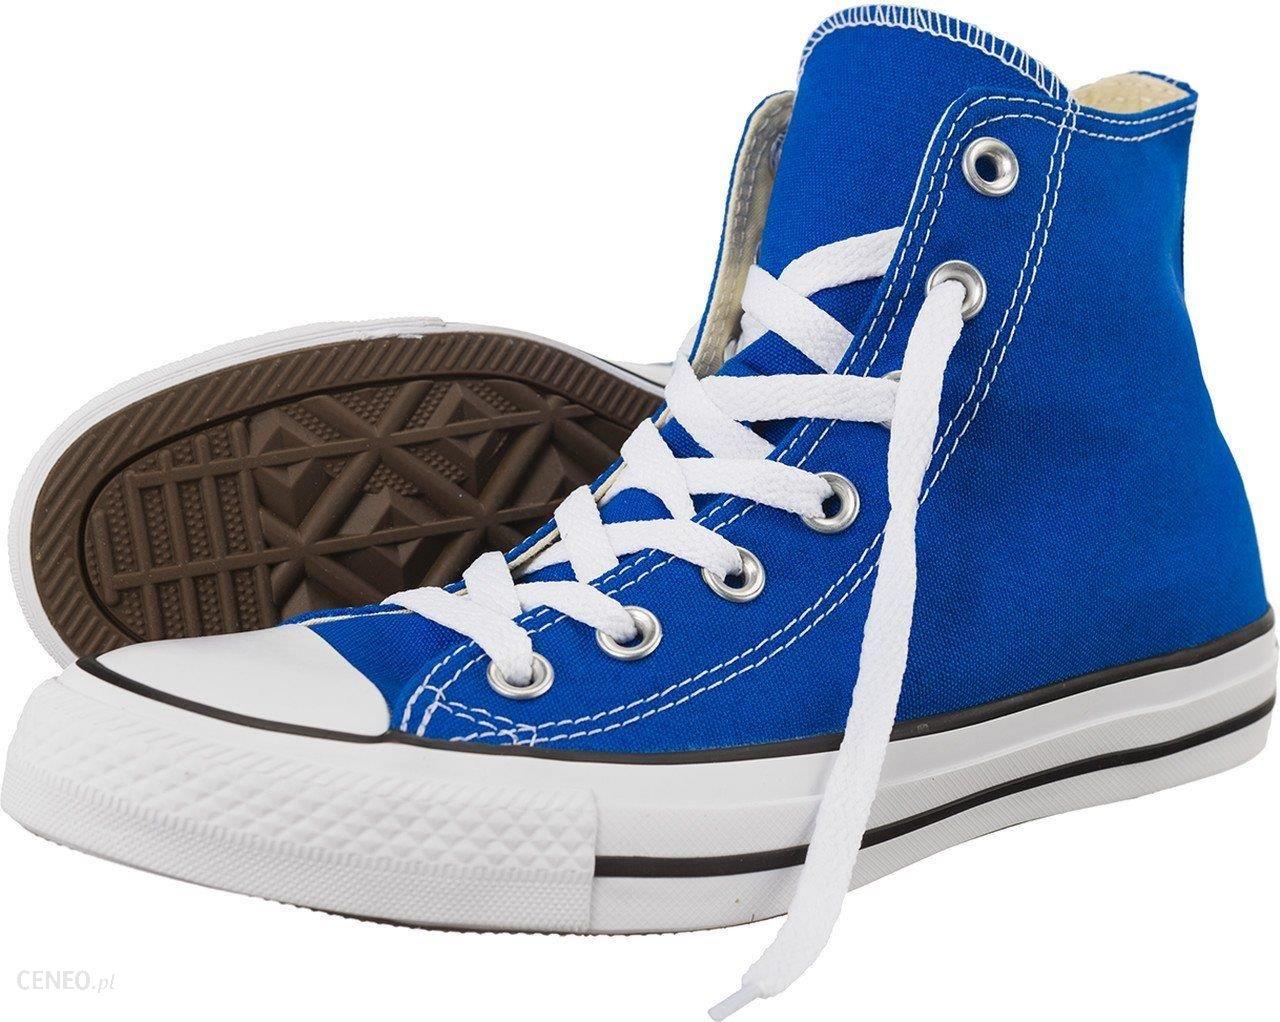 74a11d47335c4 Converse Trampki męskie Chuck Taylor All Star niebieskie r. 46 (C155566) -  zdjęcie